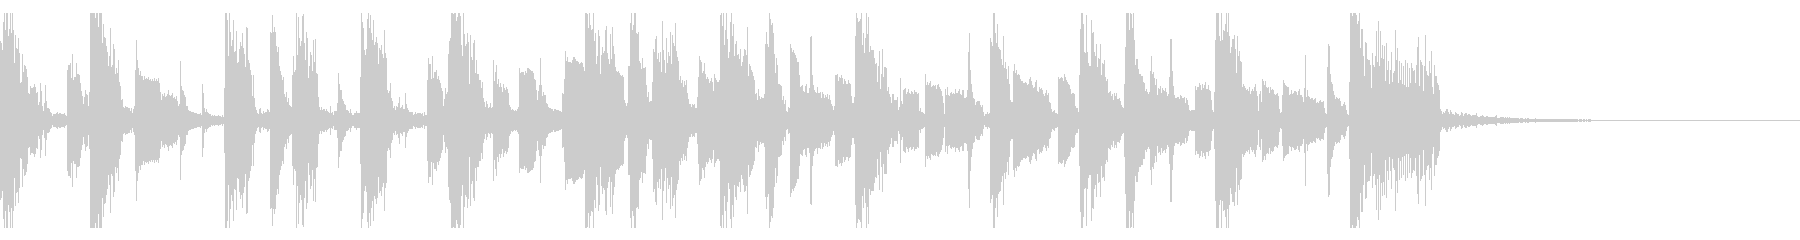 Electro jazz guitar jingle's unreproduced waveform